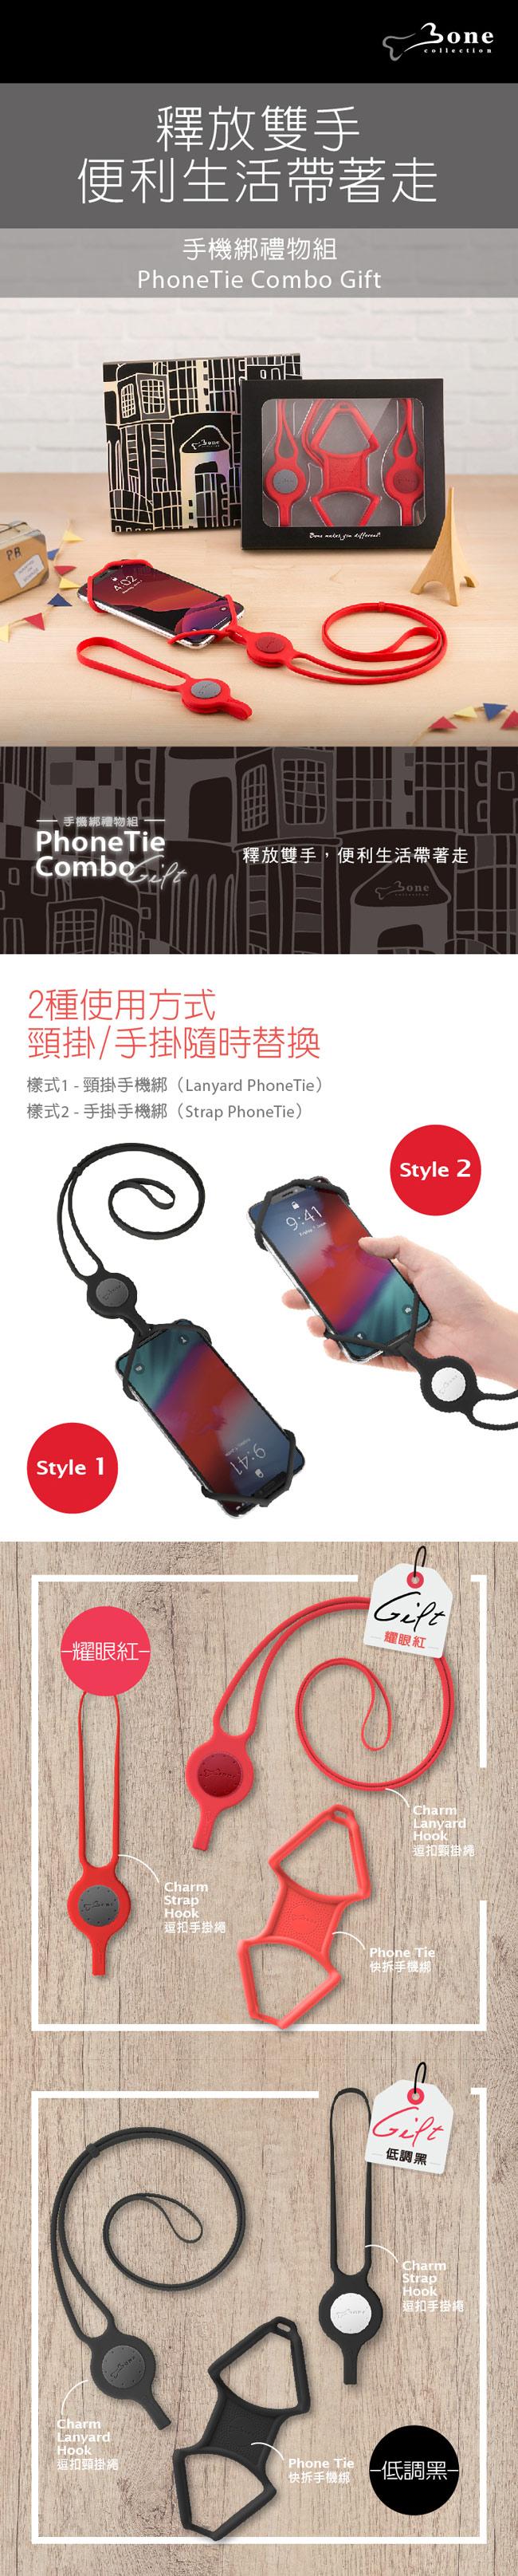 Bone|手機綁禮物組 PhoneTie Combo Gift - 低調黑 / 耀眼紅